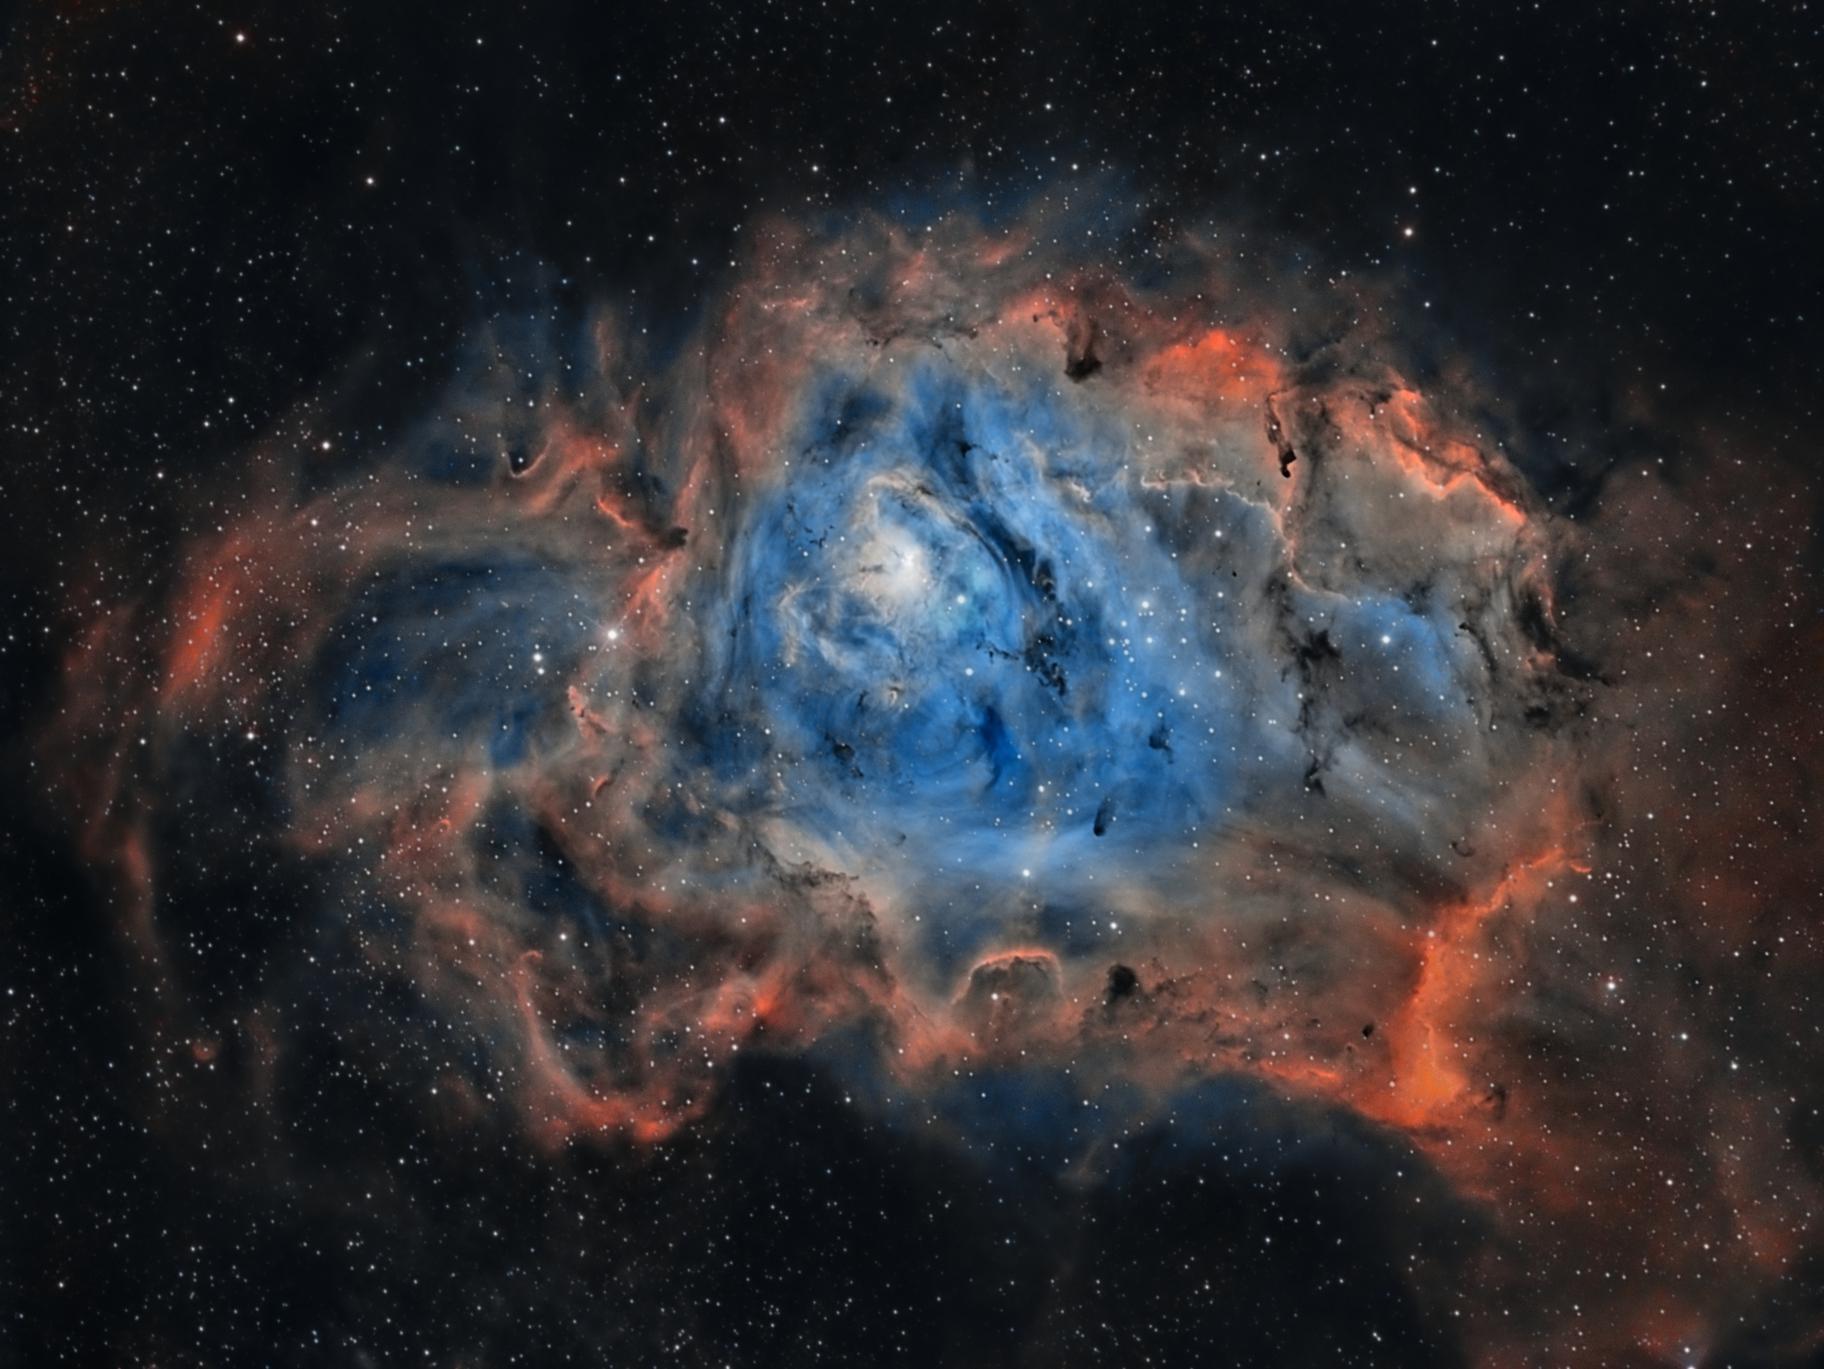 Lagoon Nebula by Frank Breslawski